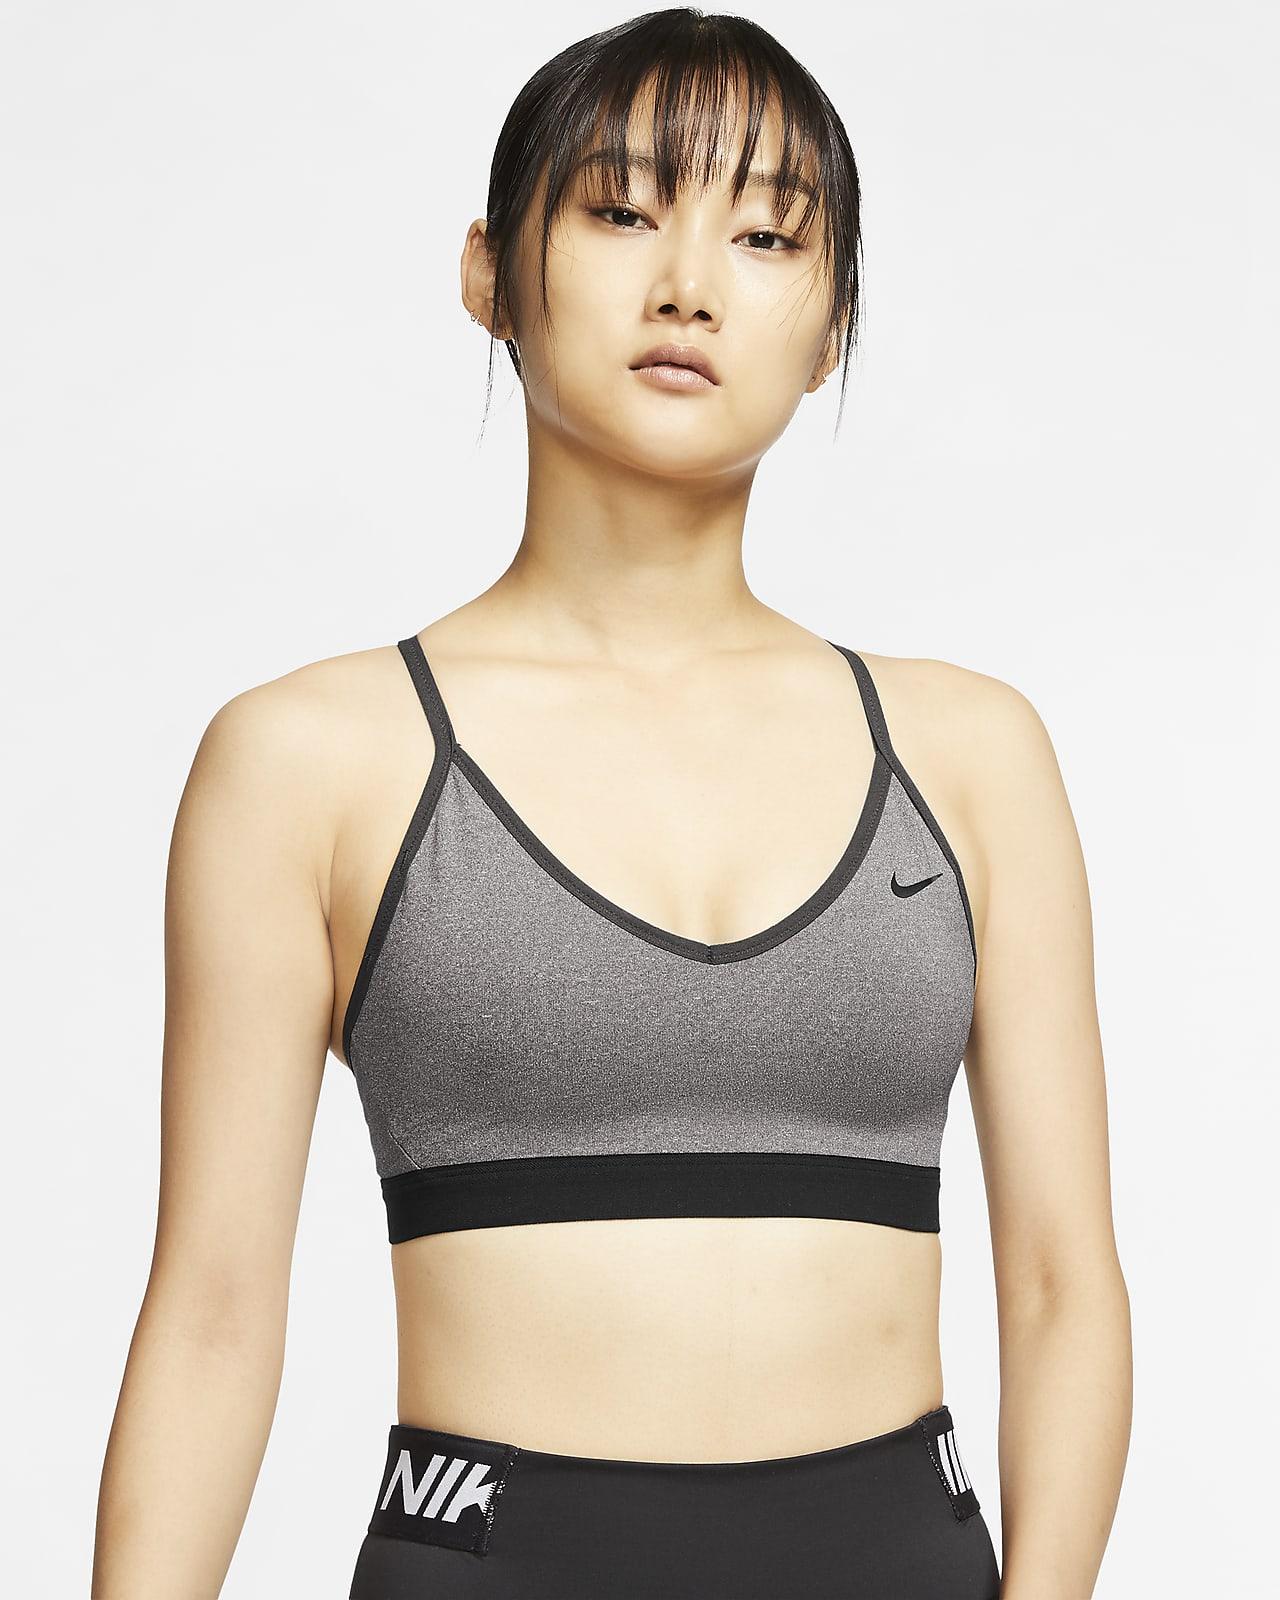 Nike Indy 女款輕度支撐型運動內衣